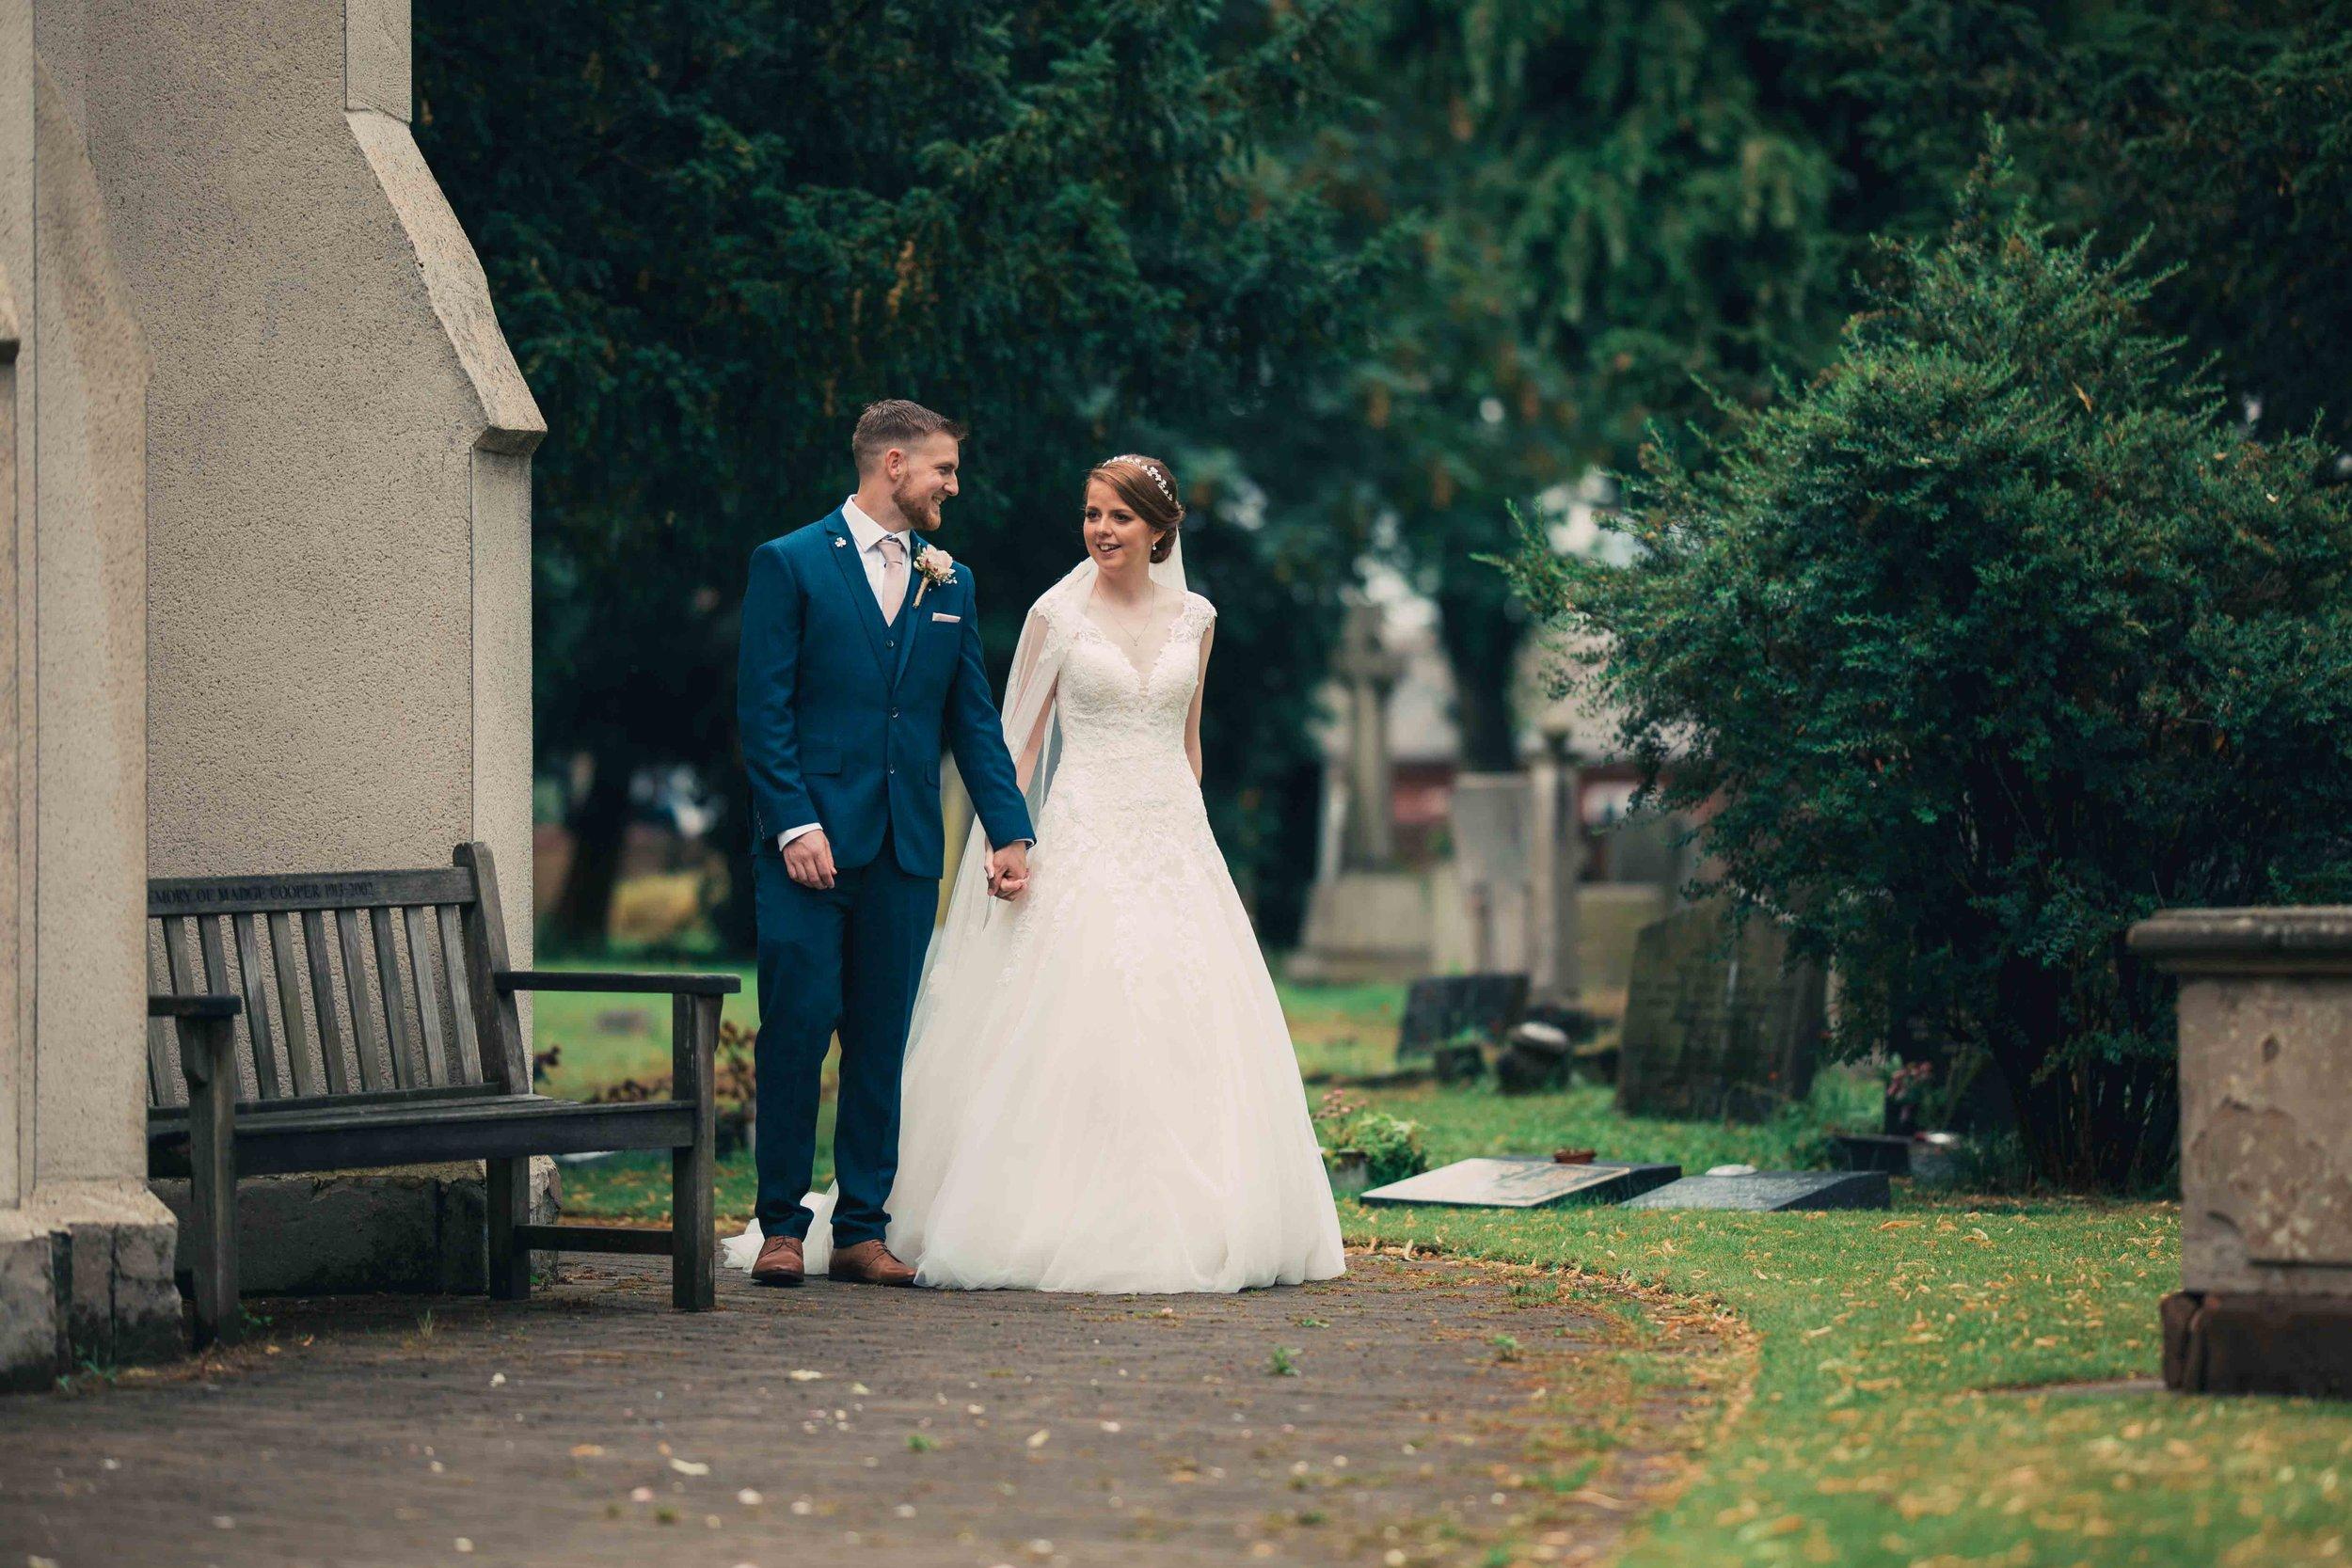 Lea-cooper-photography-willenhall-wolverhampton-wedding-photographer-birmingham-shirley-west-midlands-ceremony-church-24.JPG